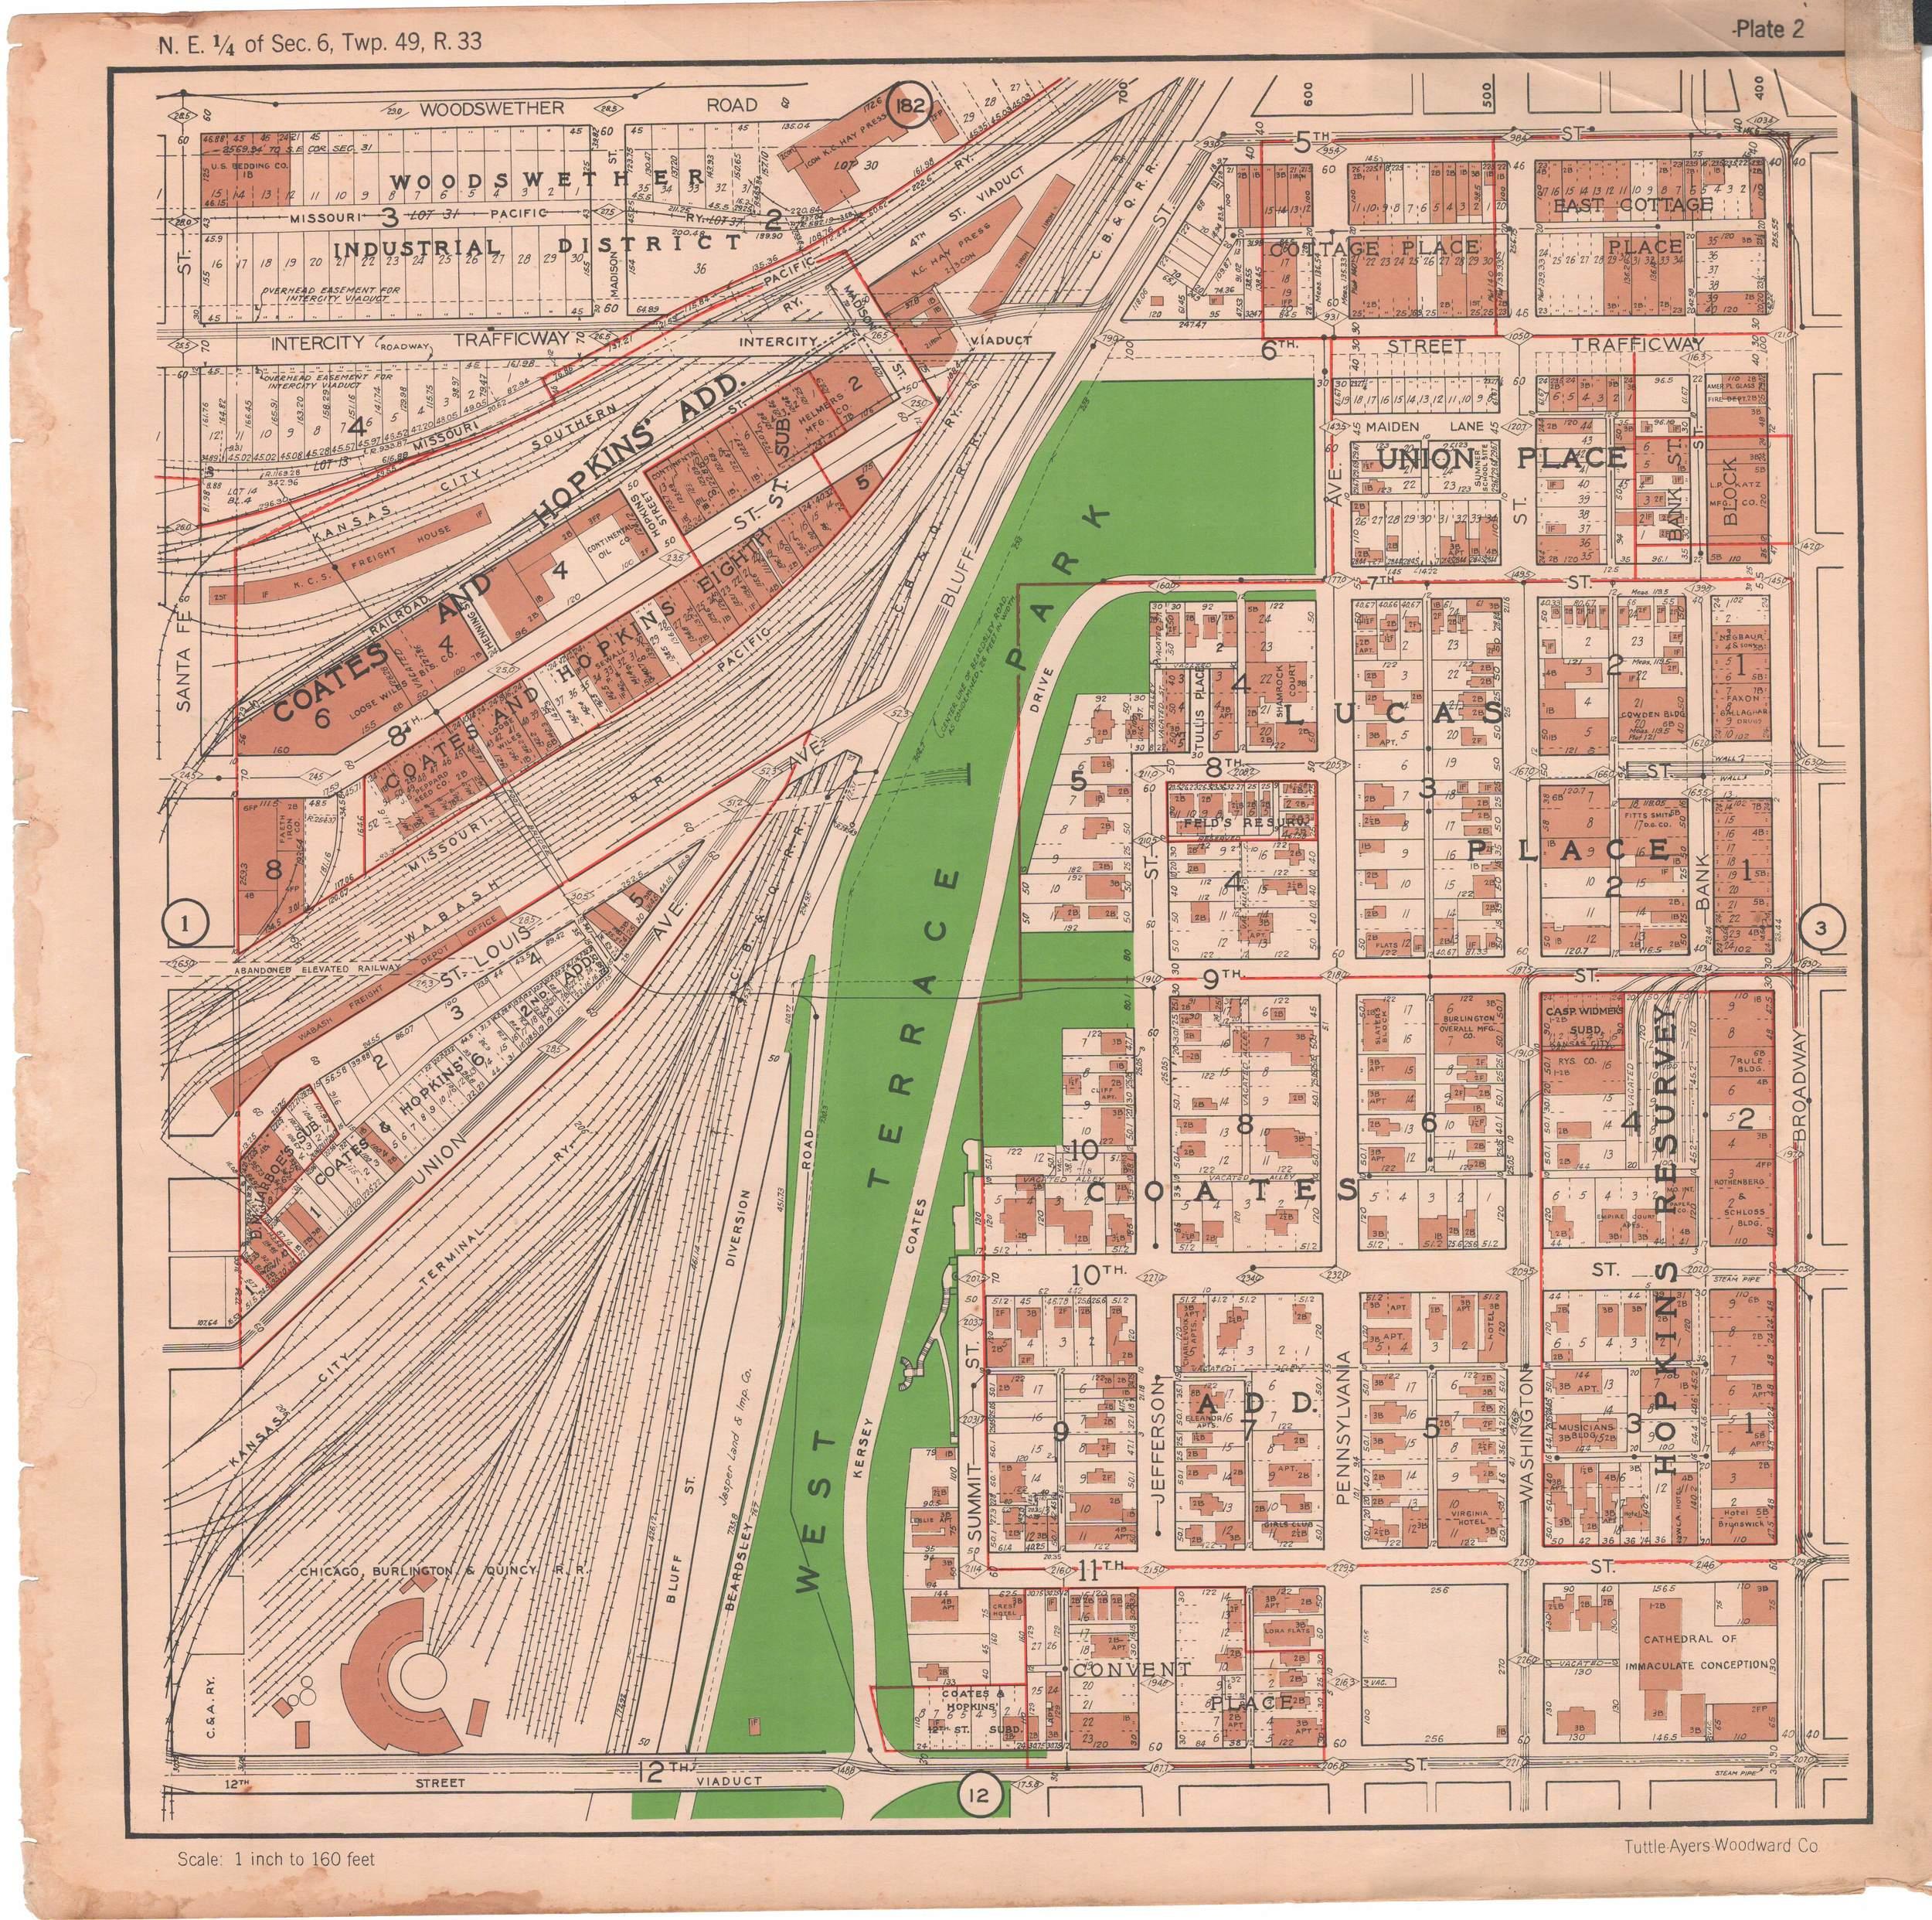 1925 TUTTLE_AYERS_Plate 2.JPG